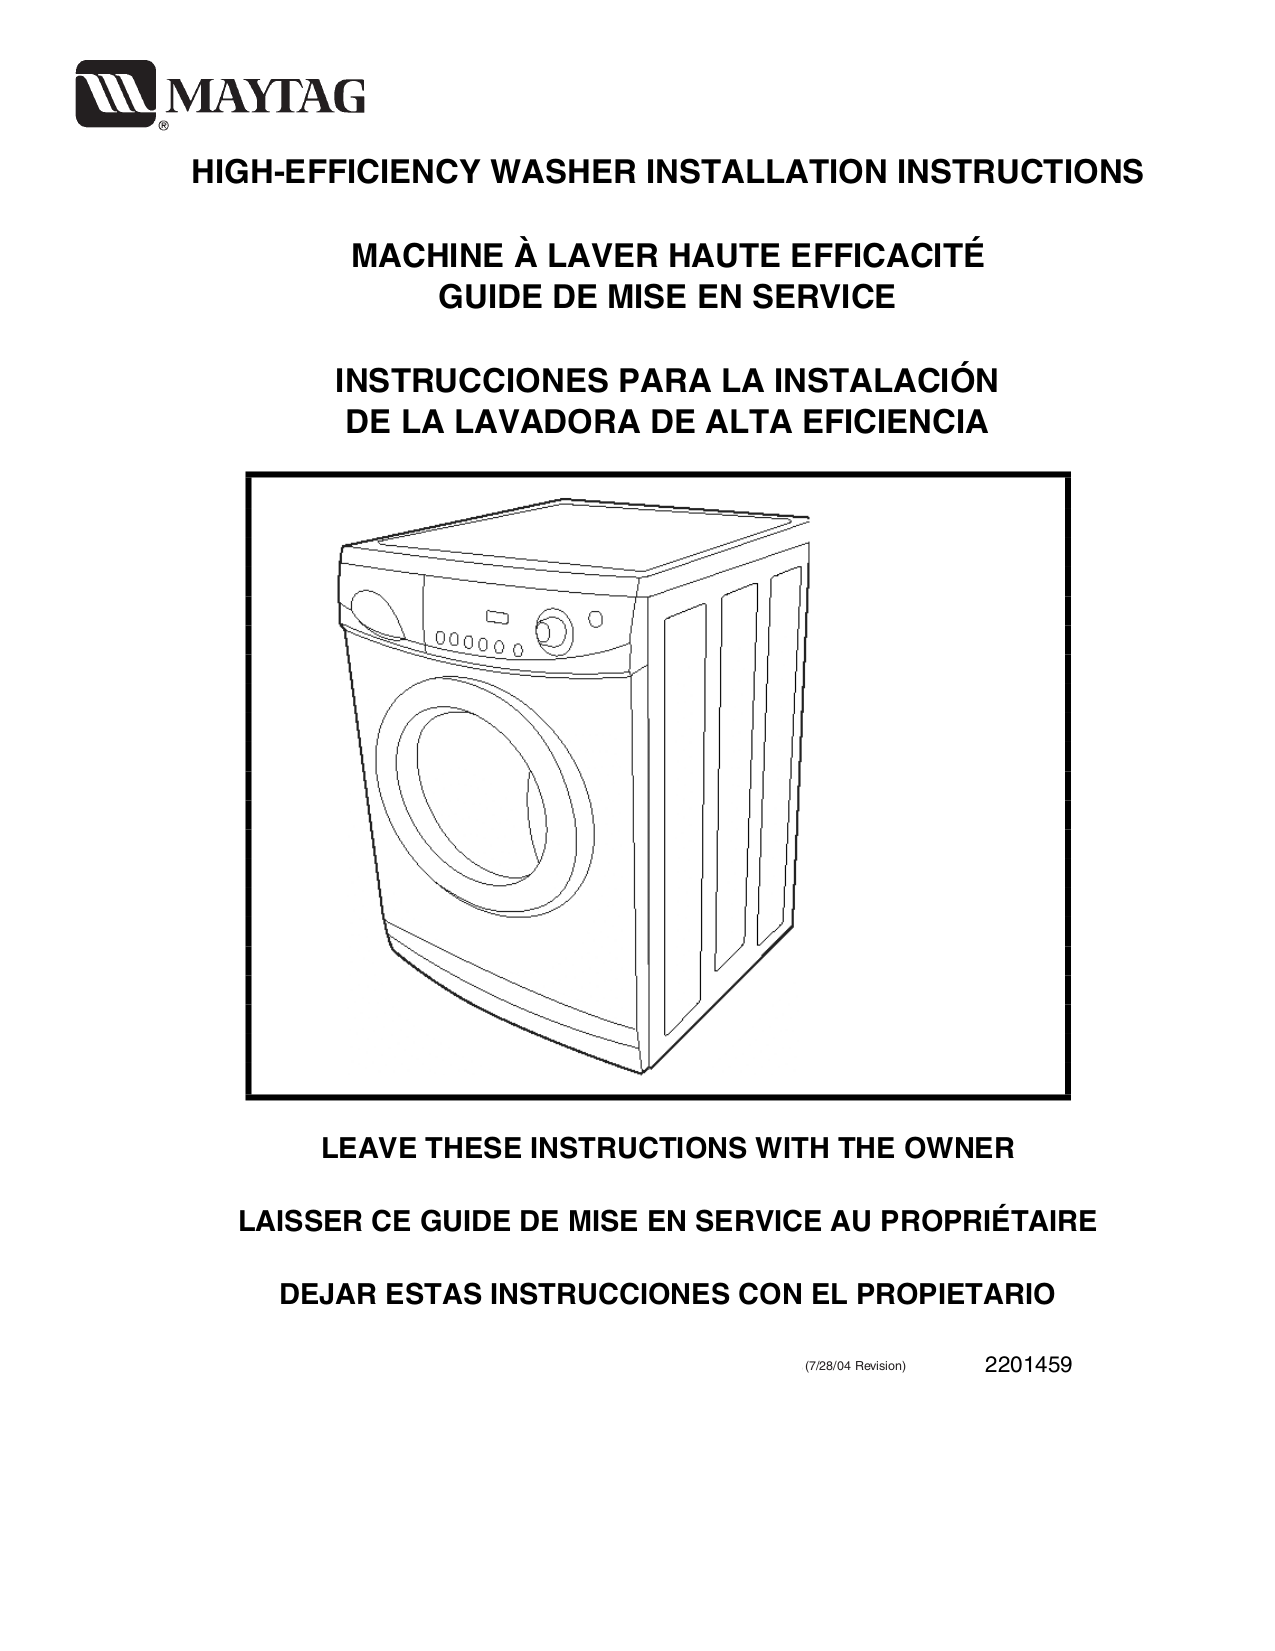 Download free pdf for Maytag MAH2400A Washer manual on maytag parts diagram, frigidaire dishwasher schematic, kenmore dishwasher schematic, maytag wall oven schematic, lg washer schematic, maytag schematic diagram, washing machine schematic, dryer schematic, ge washer schematic, maytag wiring schematics, whirlpool washer schematic, maytag performa schematic, fisher paykel washer schematic, maytag washing machine wiring diagrams, whirlpool dishwasher schematic, samsung washer schematic, ge dishwasher schematic, kenmore washer schematic, maytag dishwasher parts manual, maytag dishwasher schematic,